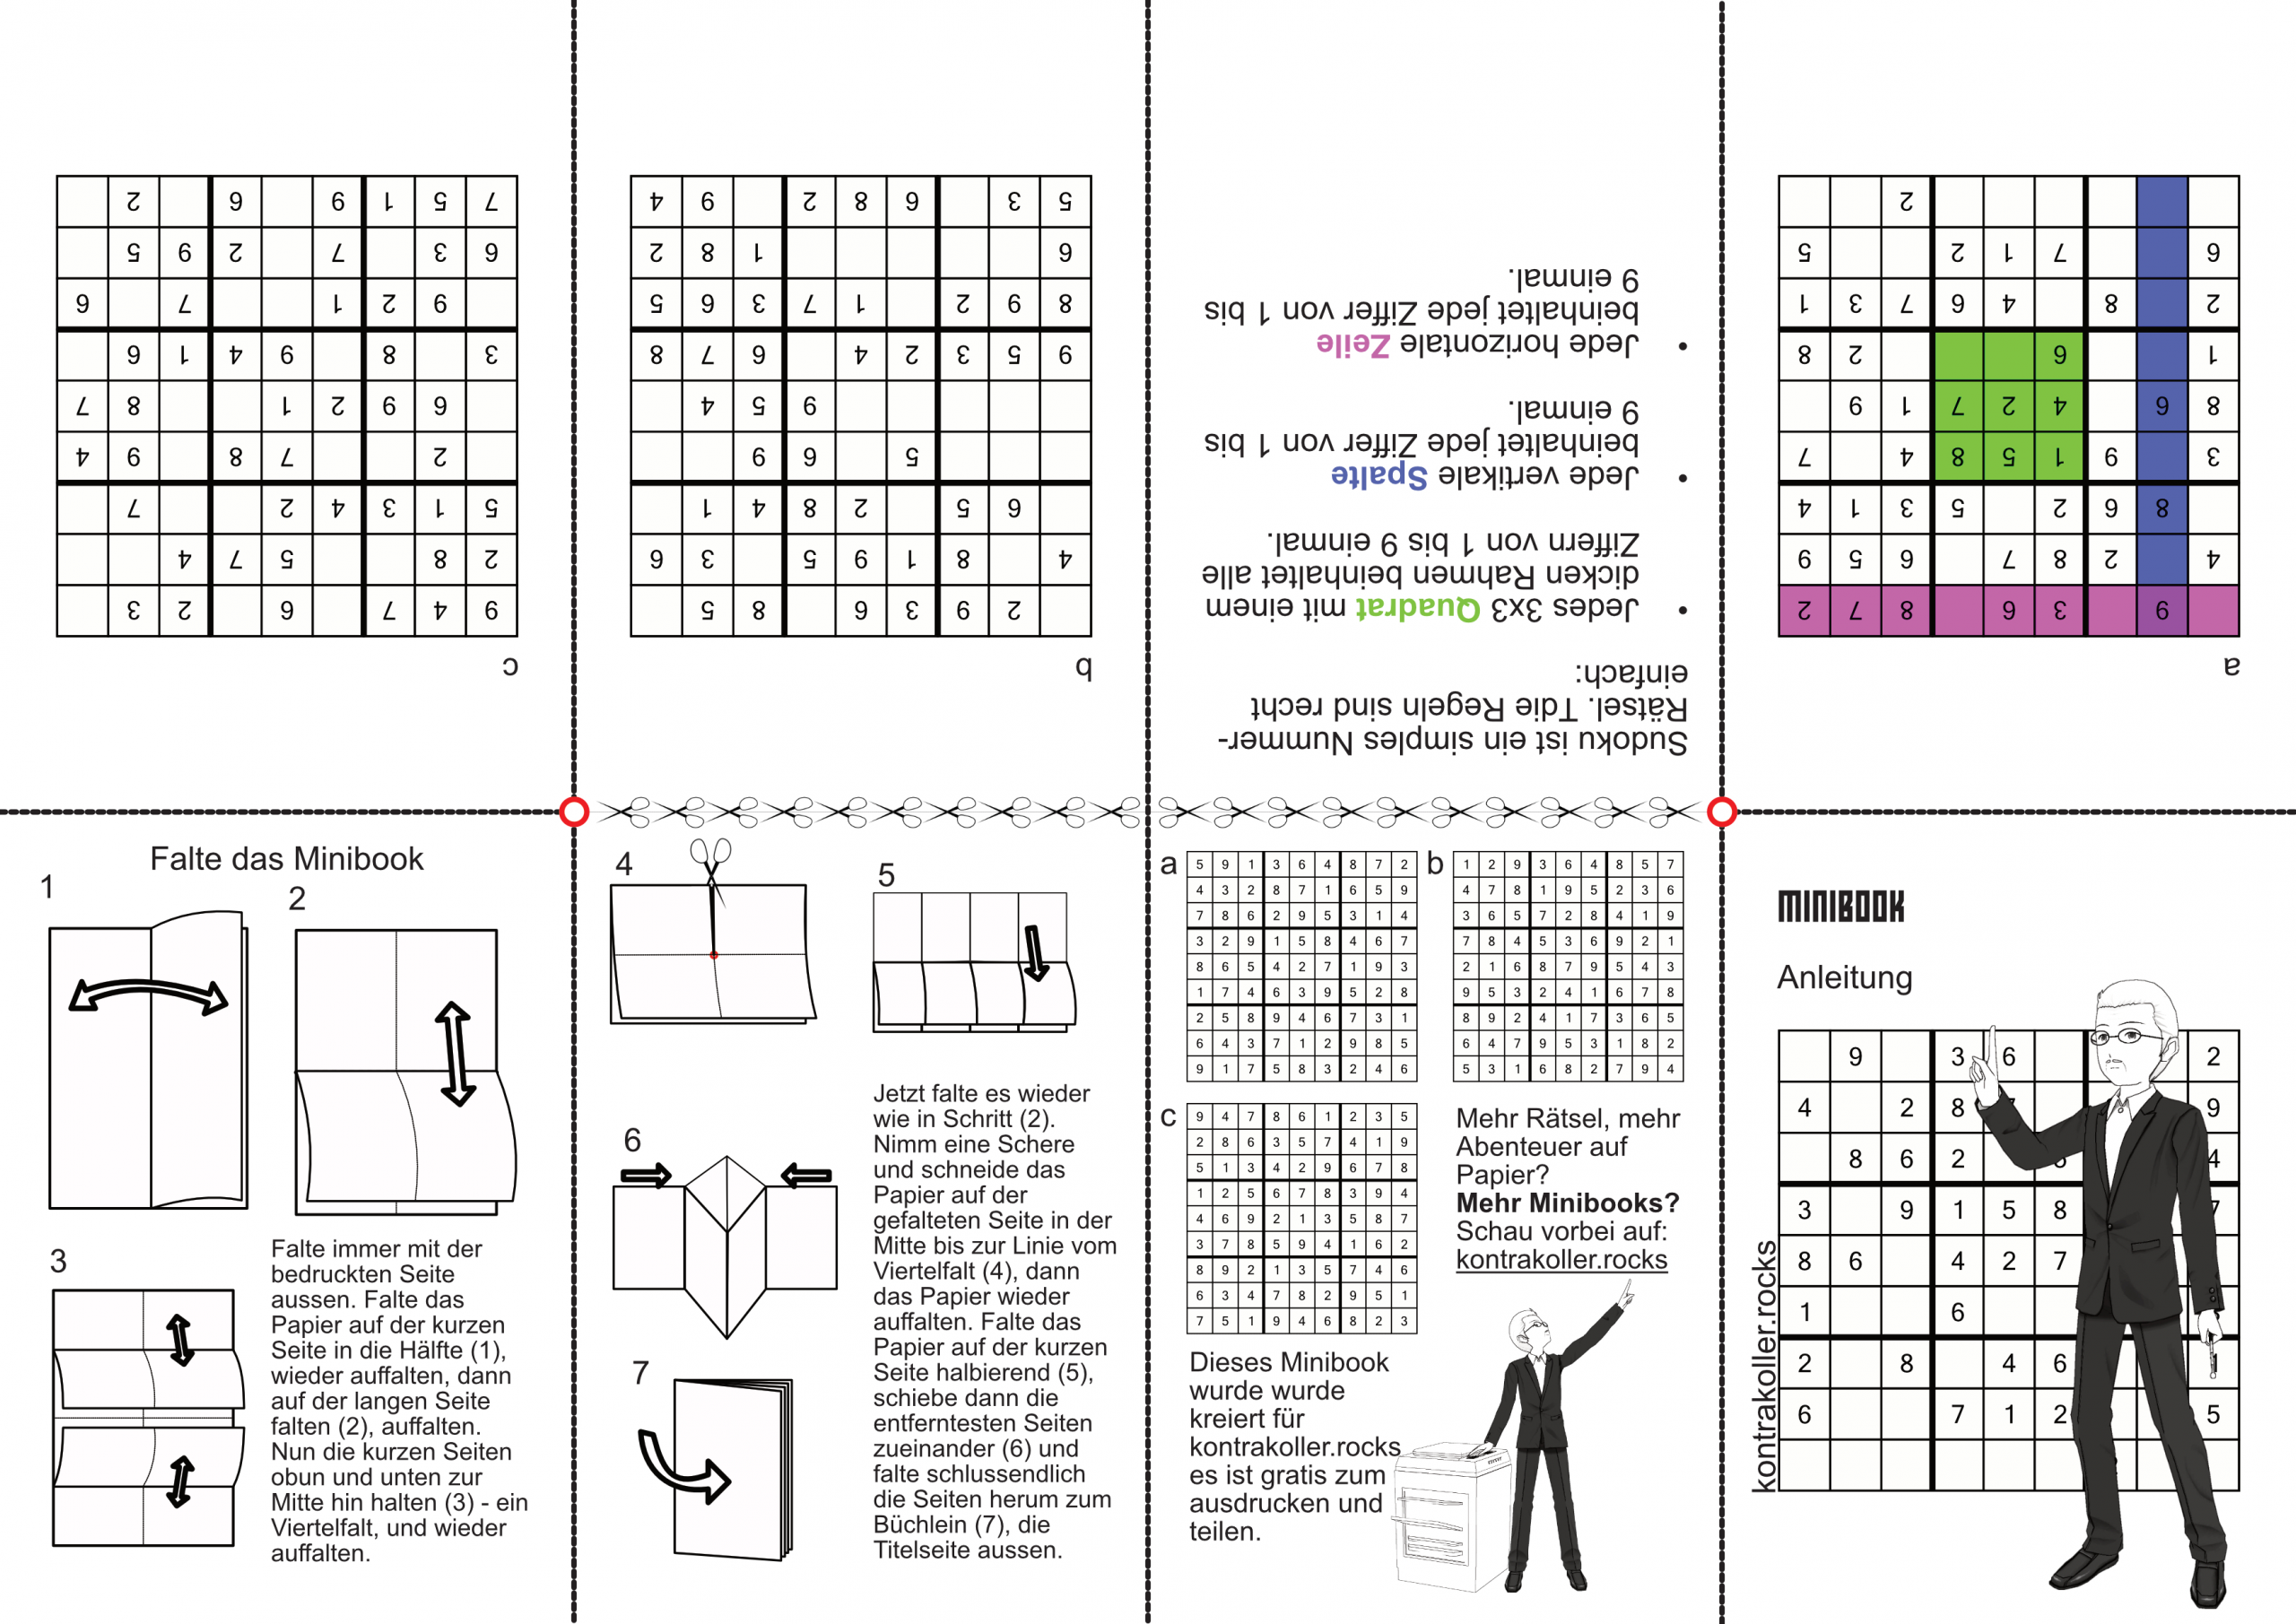 Sudoku Rätsel - Kontra Koller Rocks über Sudoku Anleitung